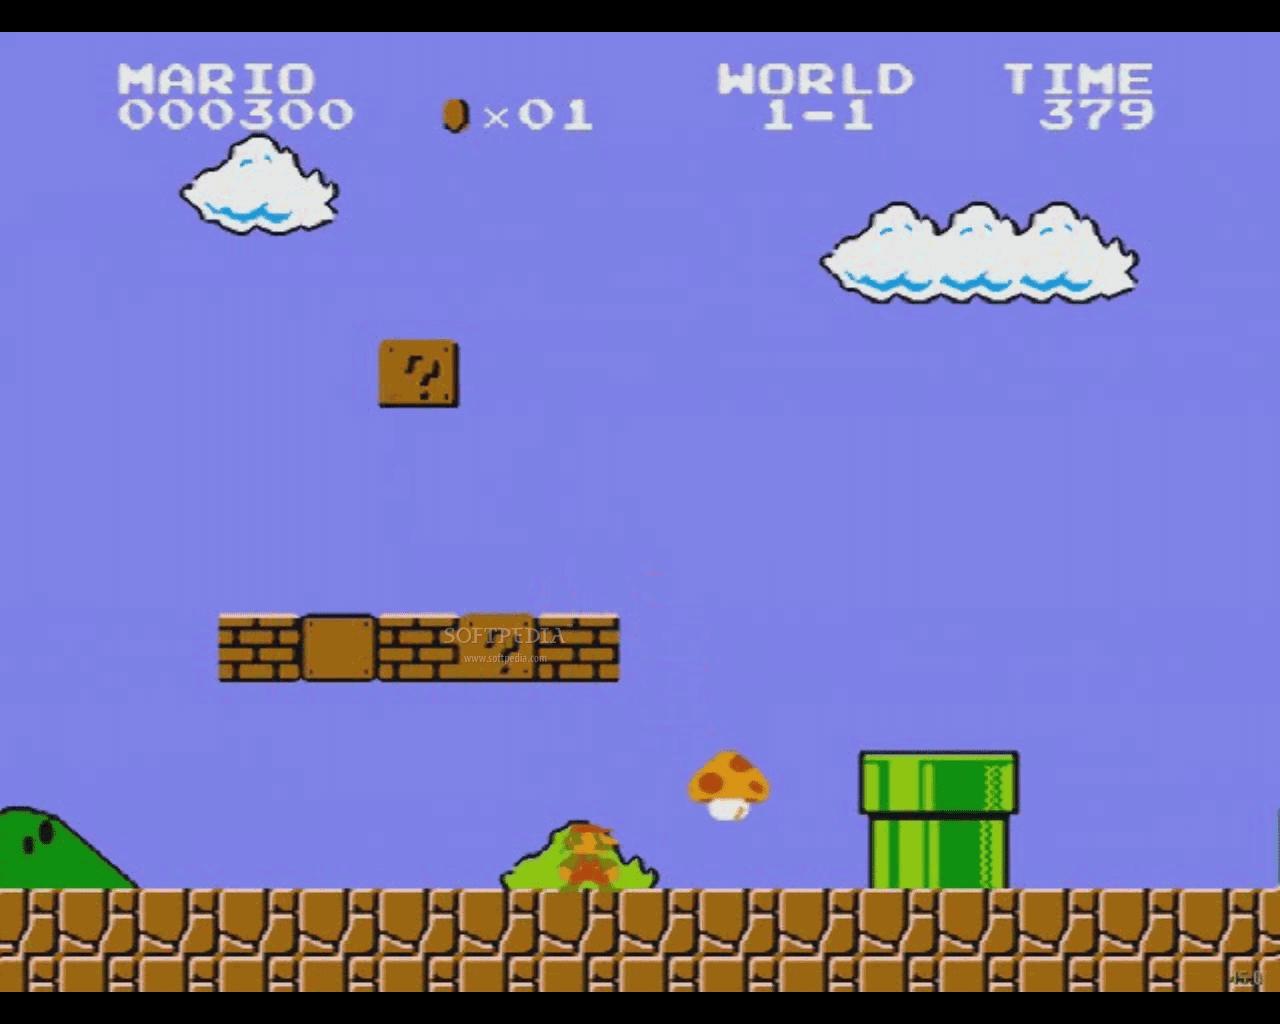 historia videojuego atari playcoin Atari